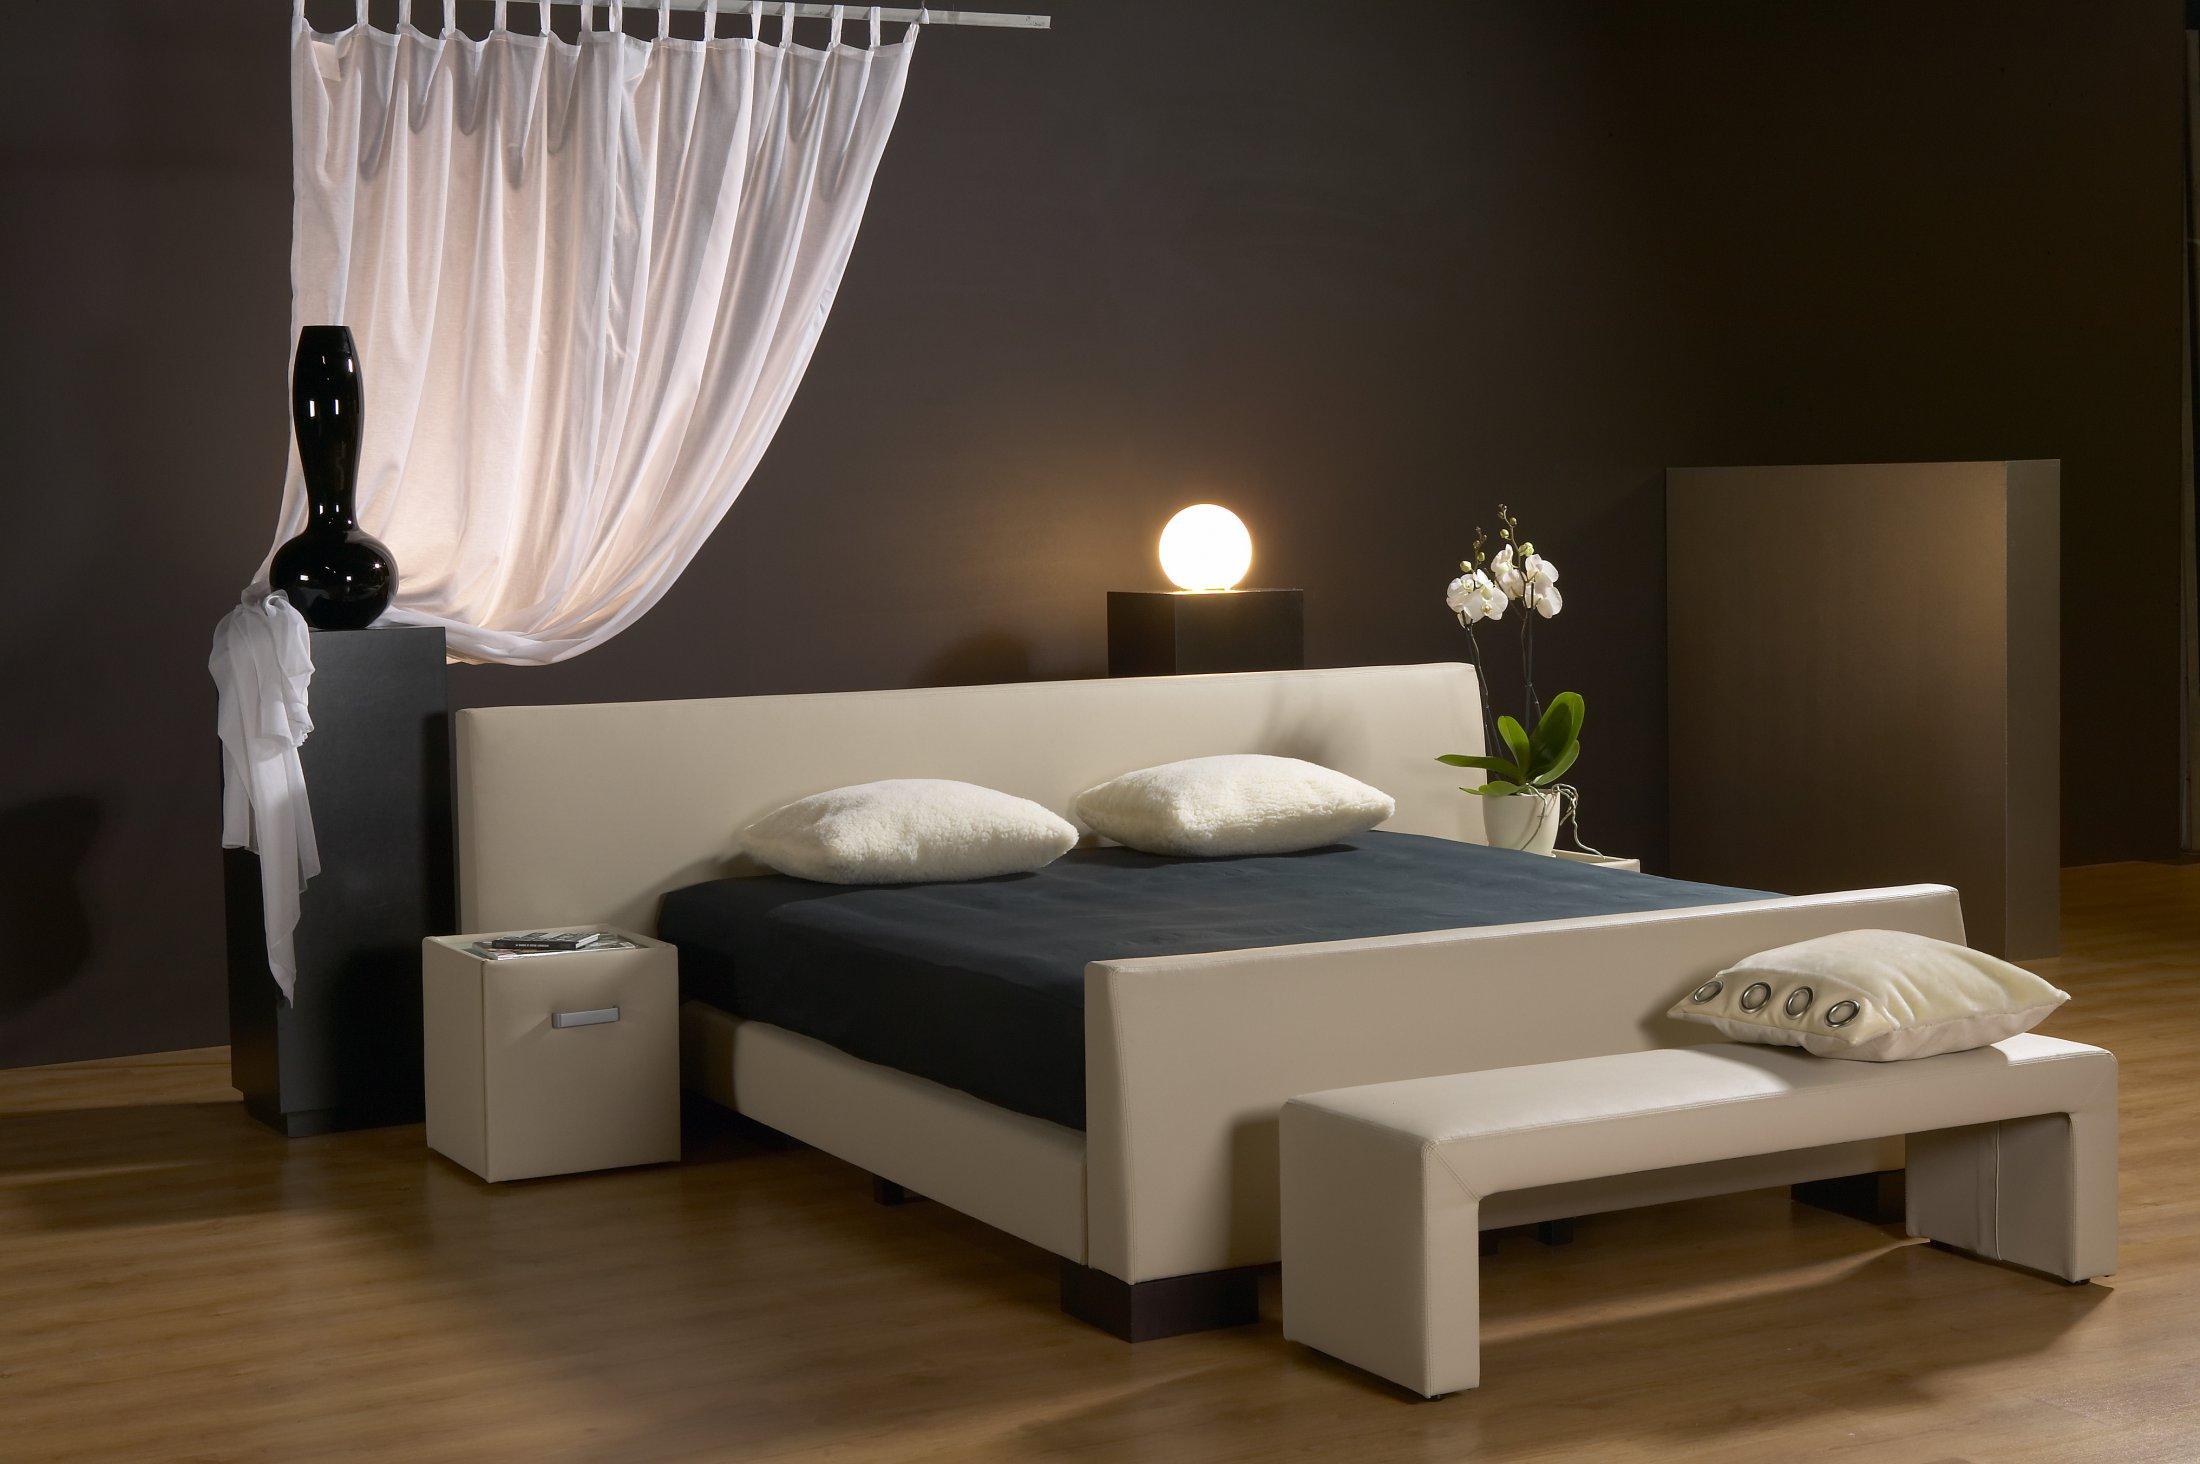 boxspring velda trendy velda boxspring versus with boxspring velda fabulous boxspring velda. Black Bedroom Furniture Sets. Home Design Ideas